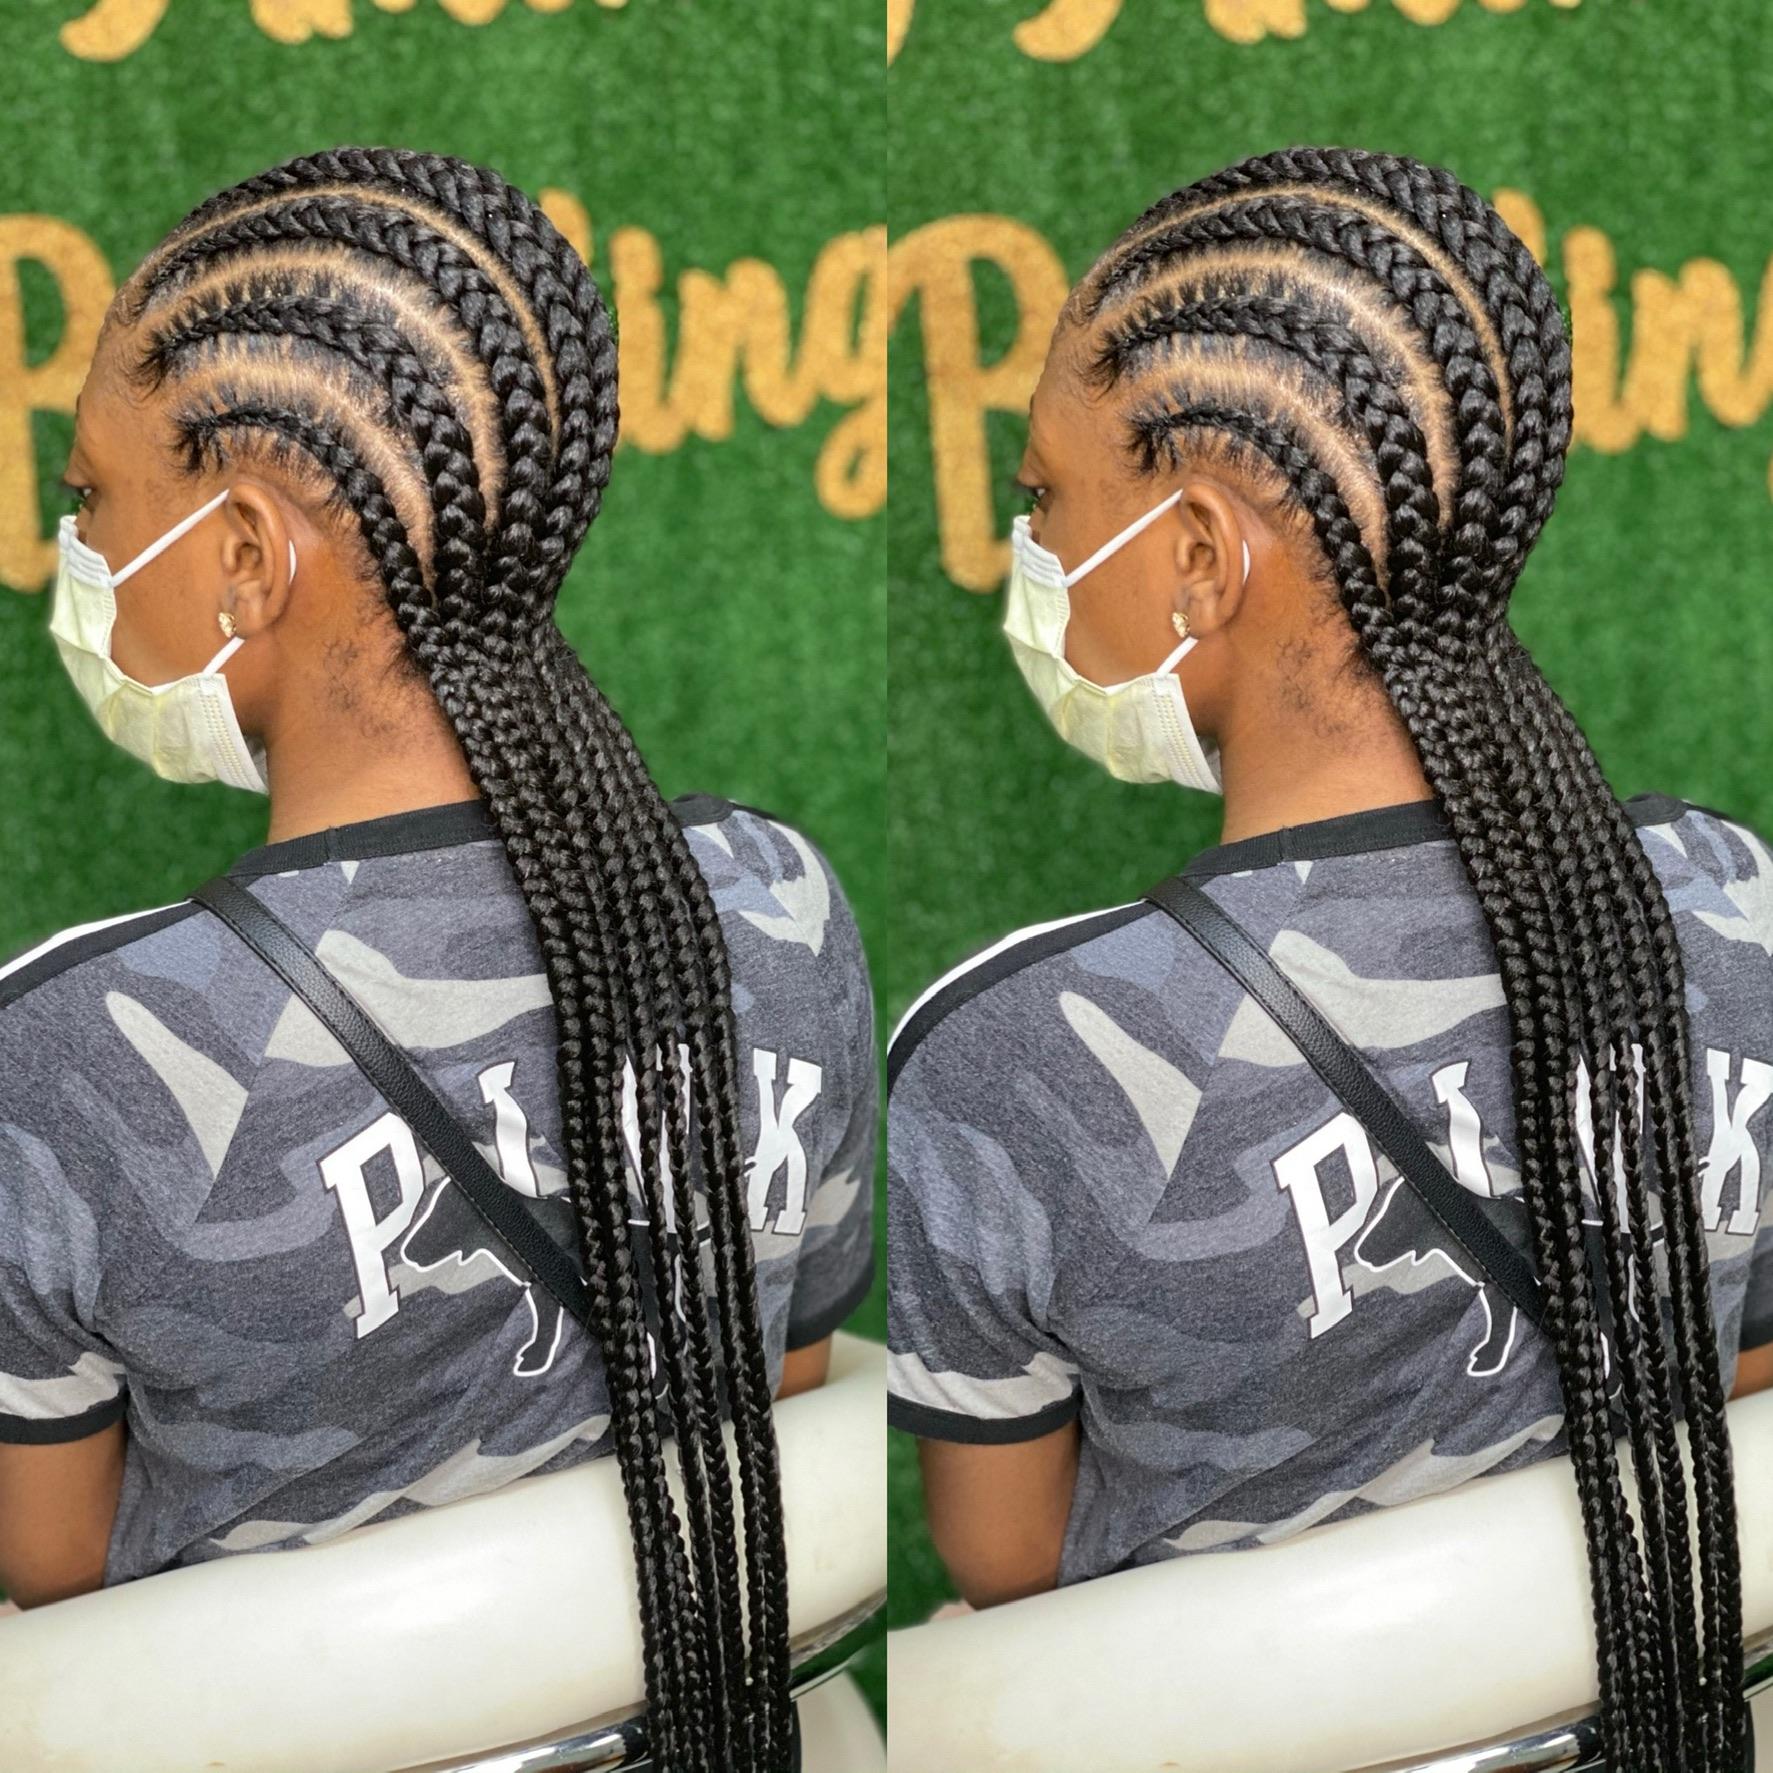 salon de coiffure afro tresse tresses box braids crochet braids vanilles tissages paris 75 77 78 91 92 93 94 95 ZOEUJMXA